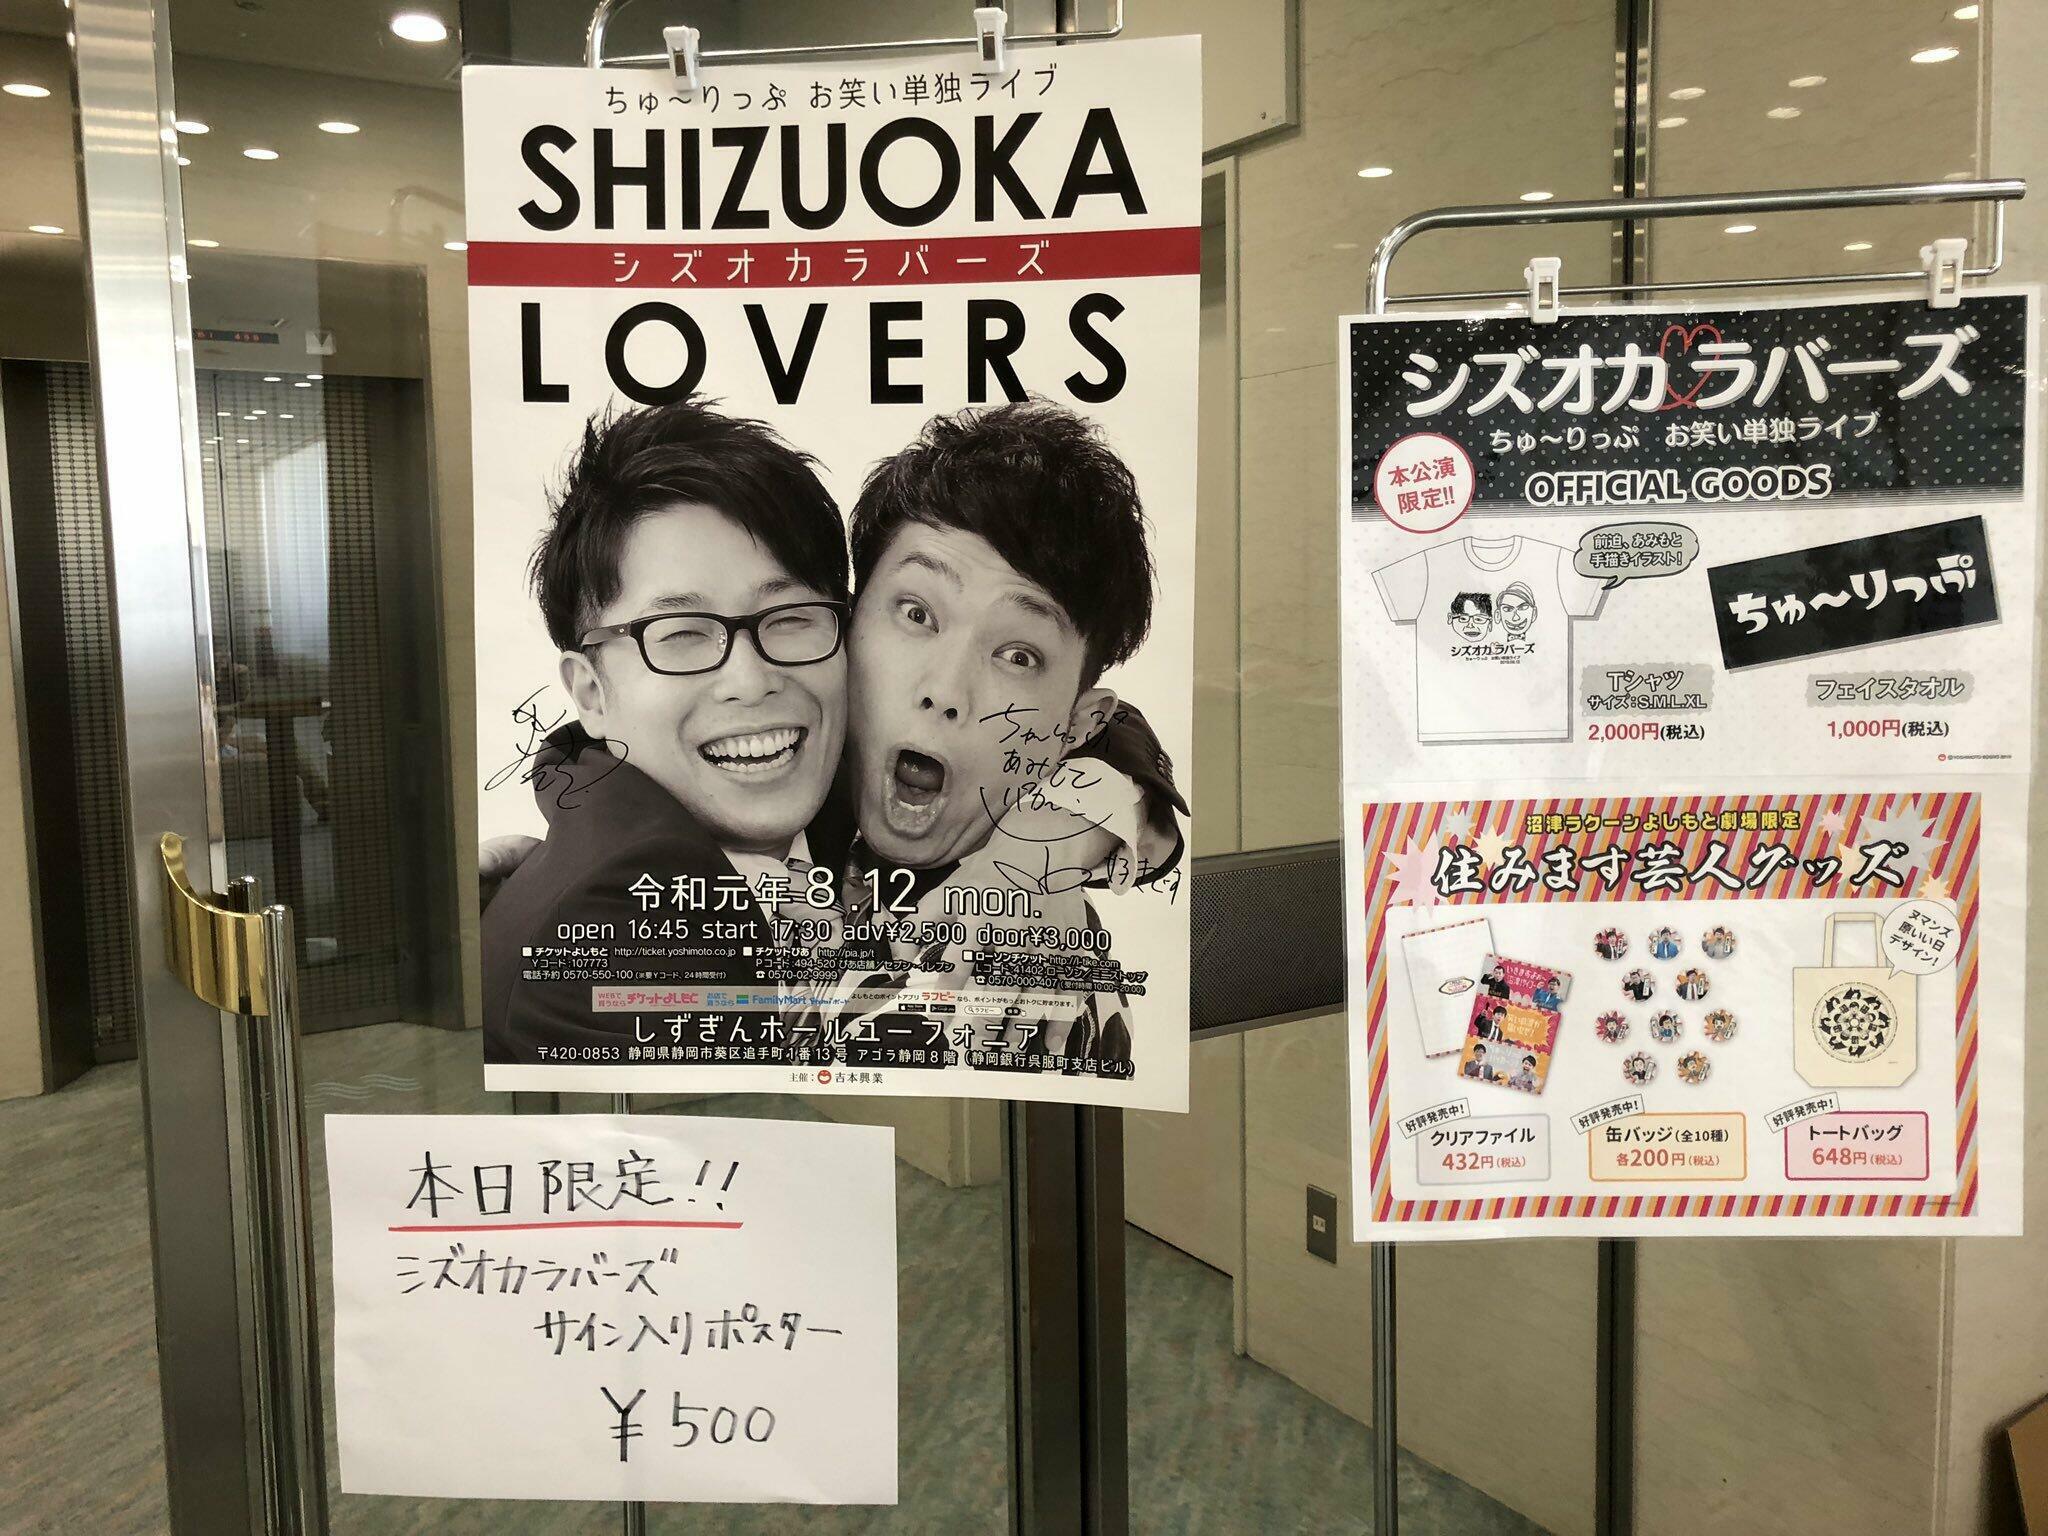 http://47web.jp/shizuoka/uploads/EBwCW82UYAAbOE9%20%281%29.jpg